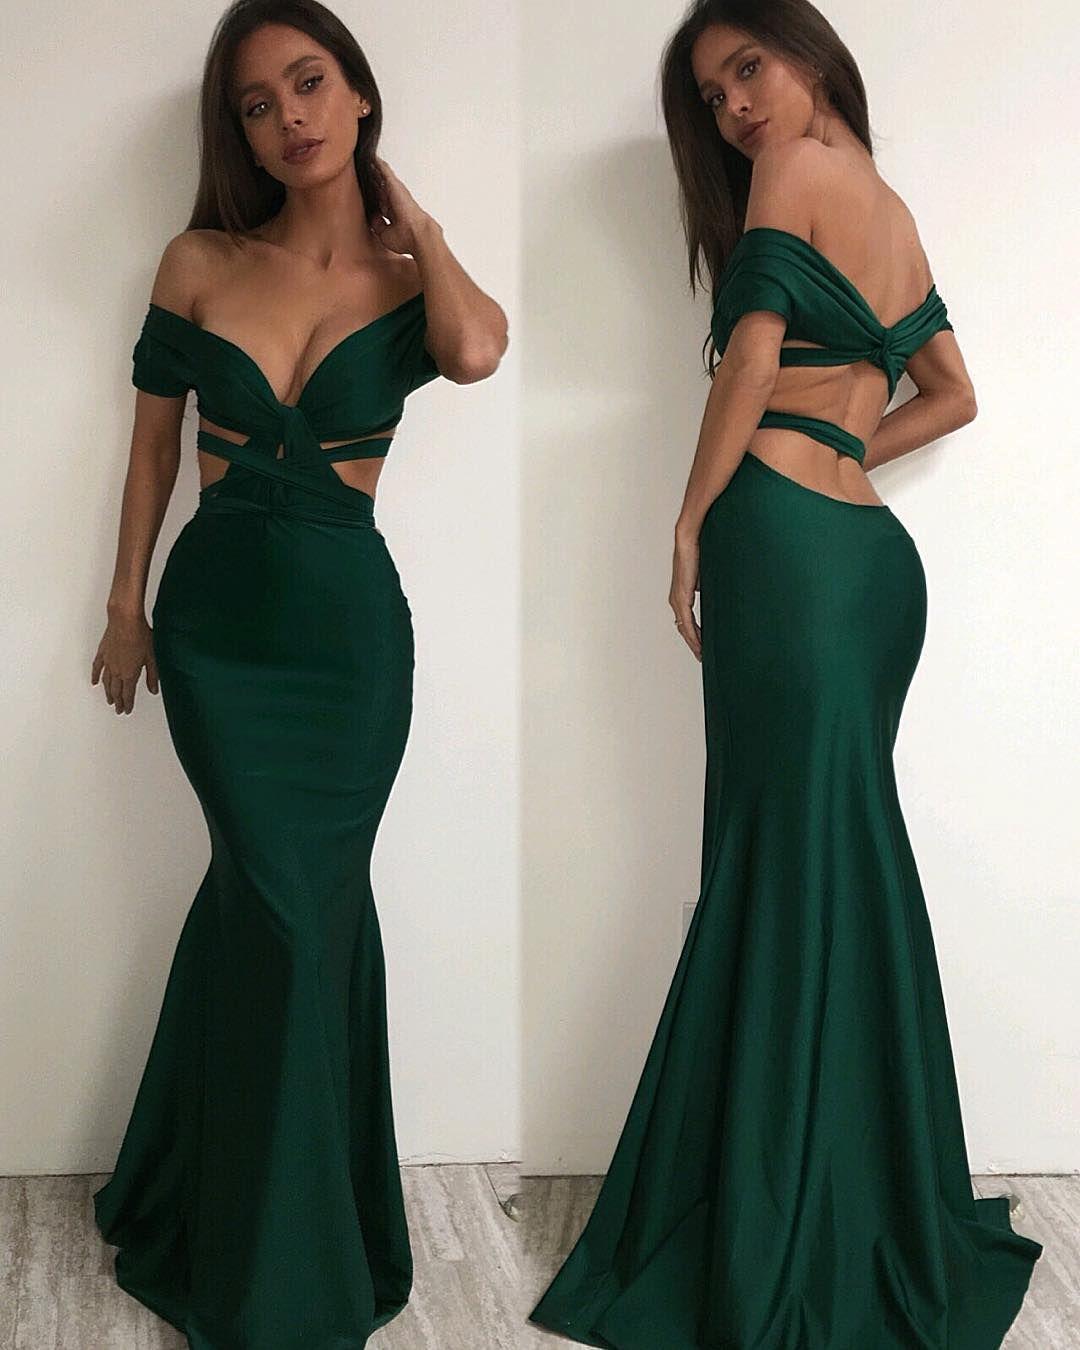 ℒℴvℯly fashion loves pinterest prom dresses dresses and prom